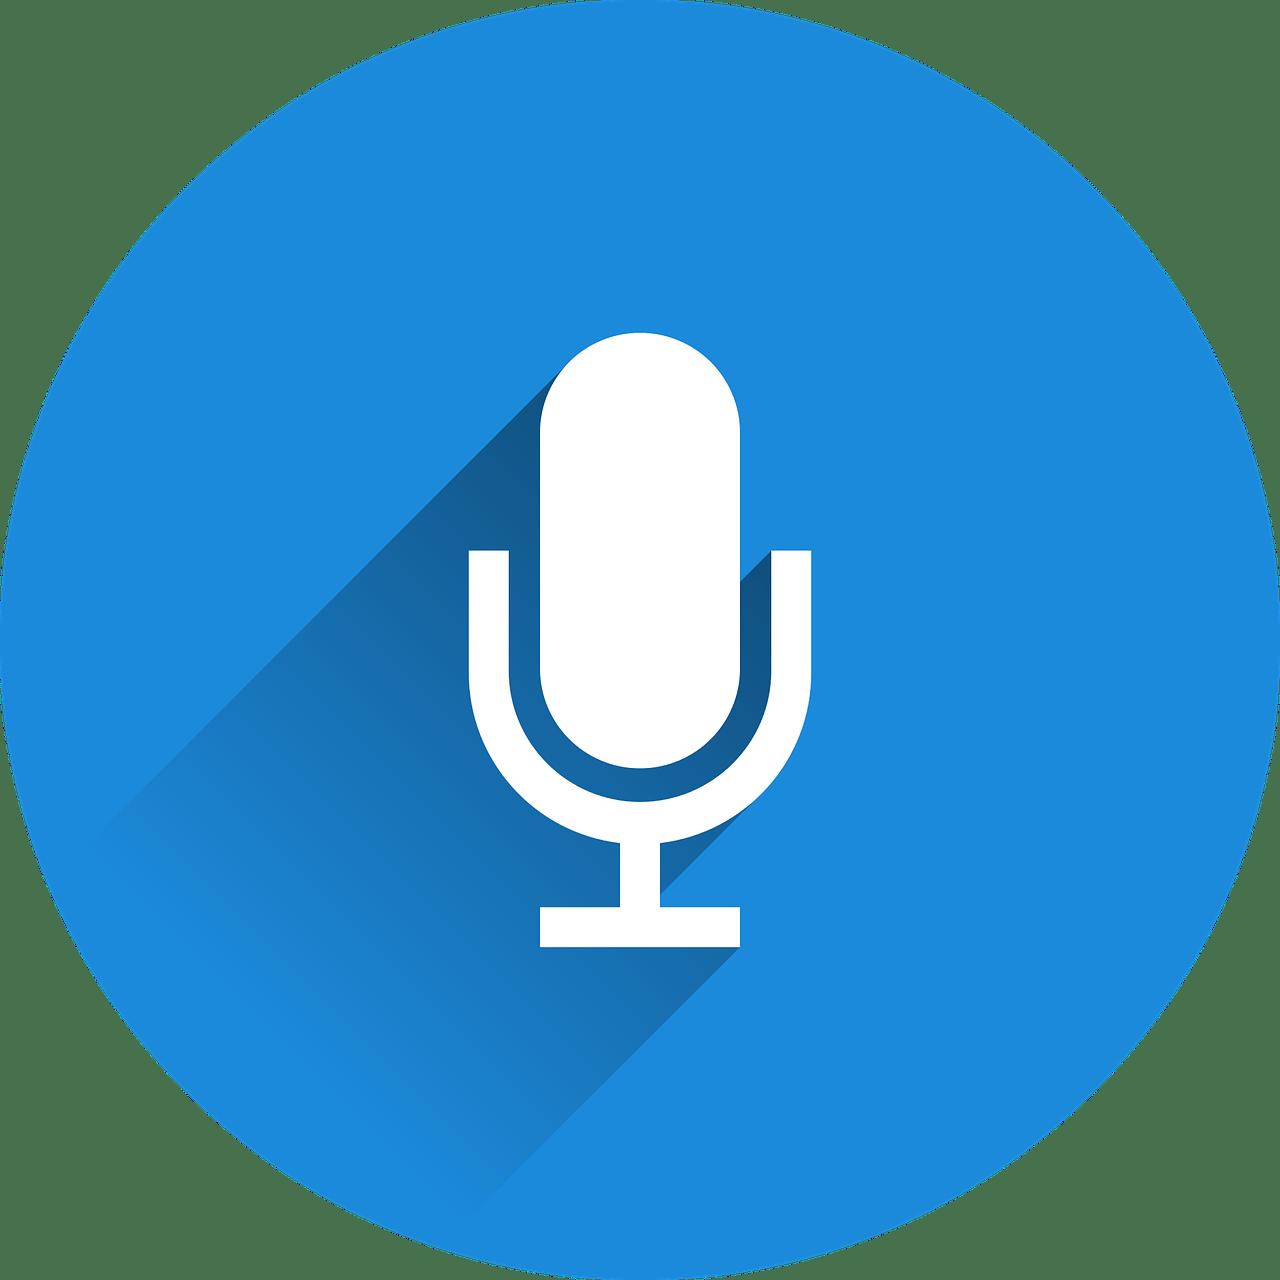 Intervju. Vir: Pixabay